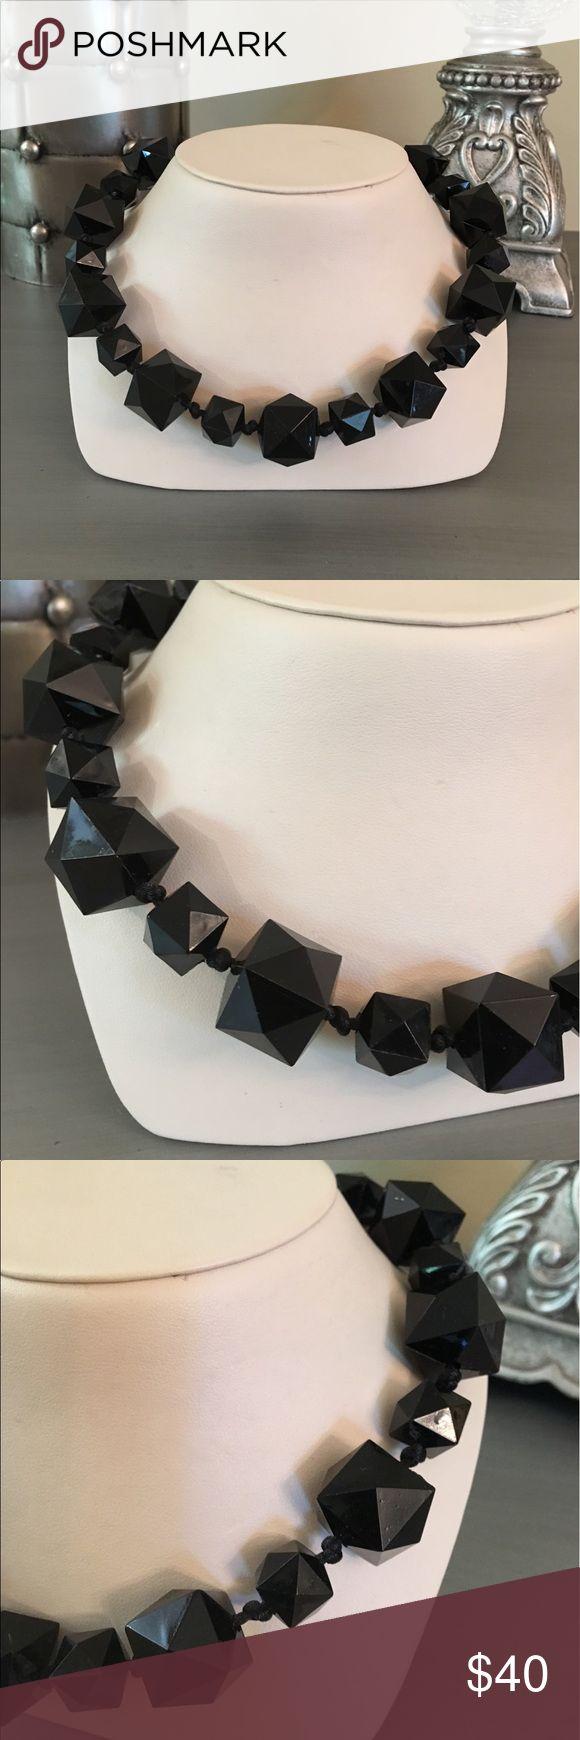 🛍 Robert Rose Black Beaded Necklace Adjustable length Robert Rose Jewelry Necklaces